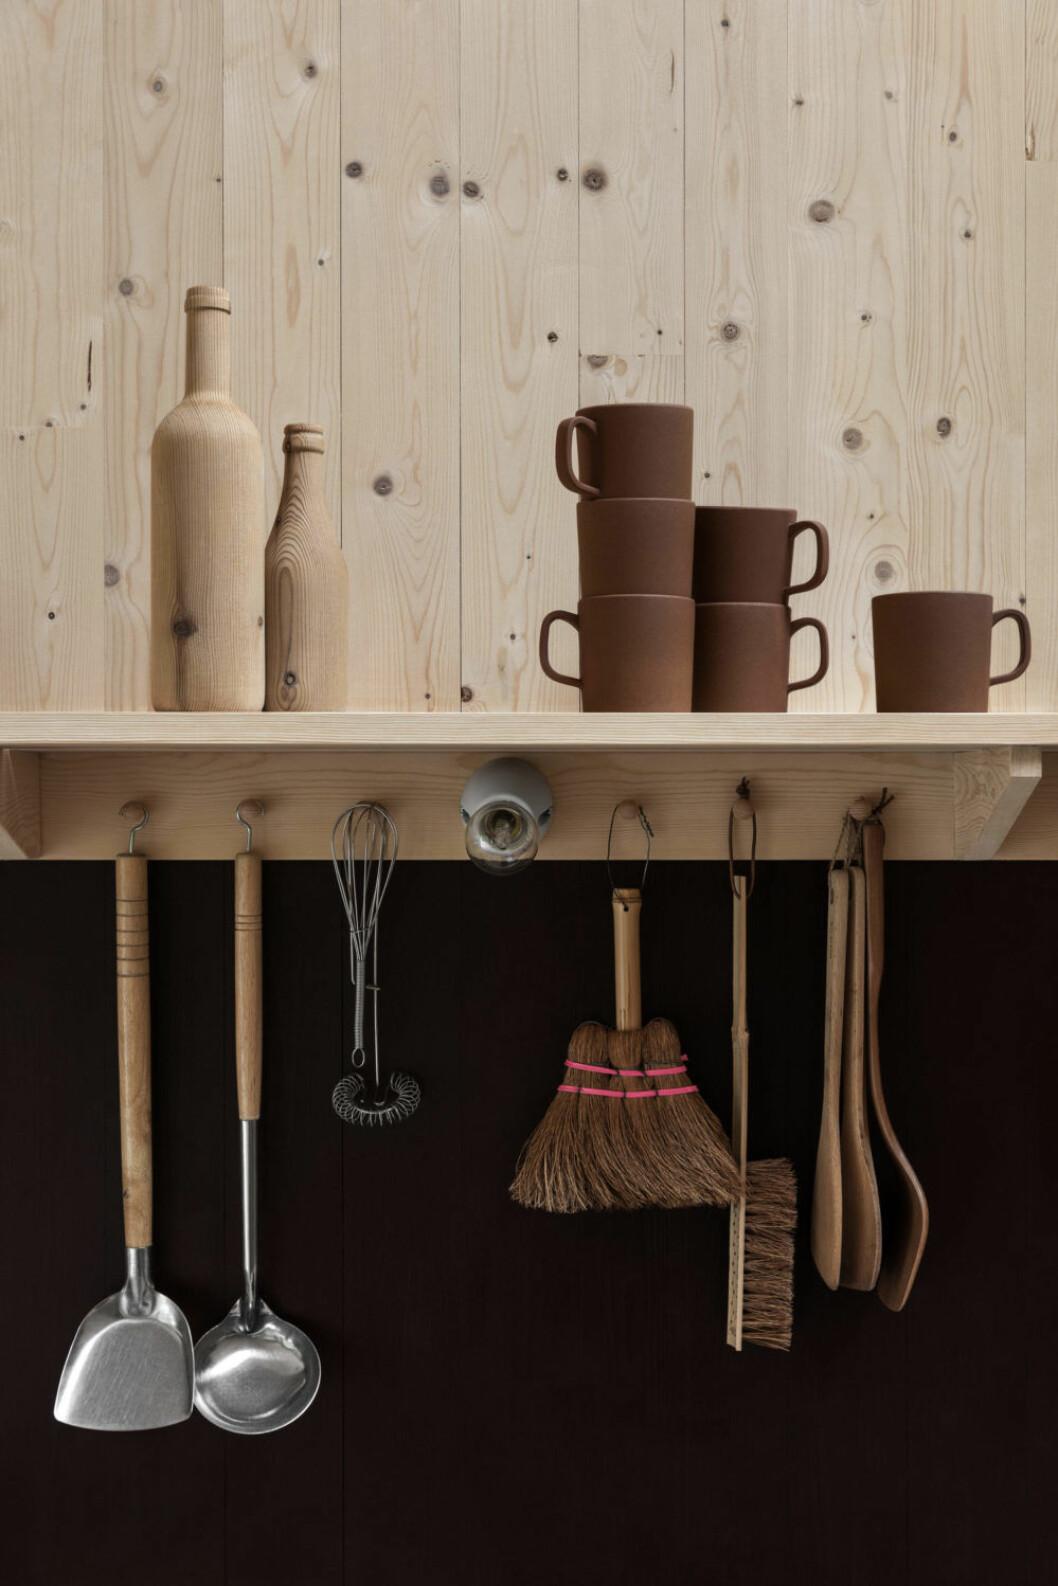 Stilleben med köksprylar i sommarstuga i plywood. Foto Erik Lefvander, styling Annaleena Leino Karlsson